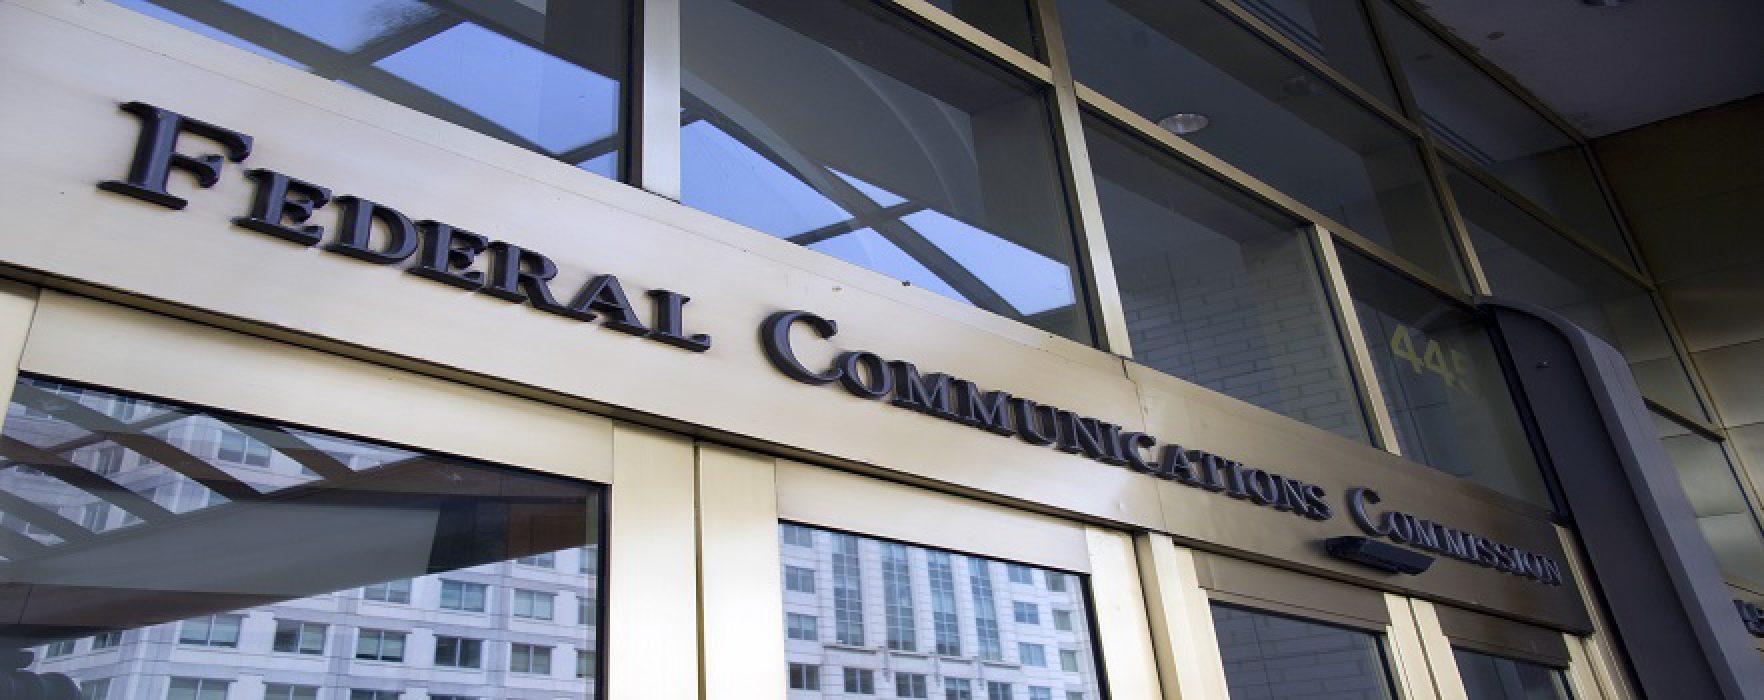 California Passes Net Neutrality Bill